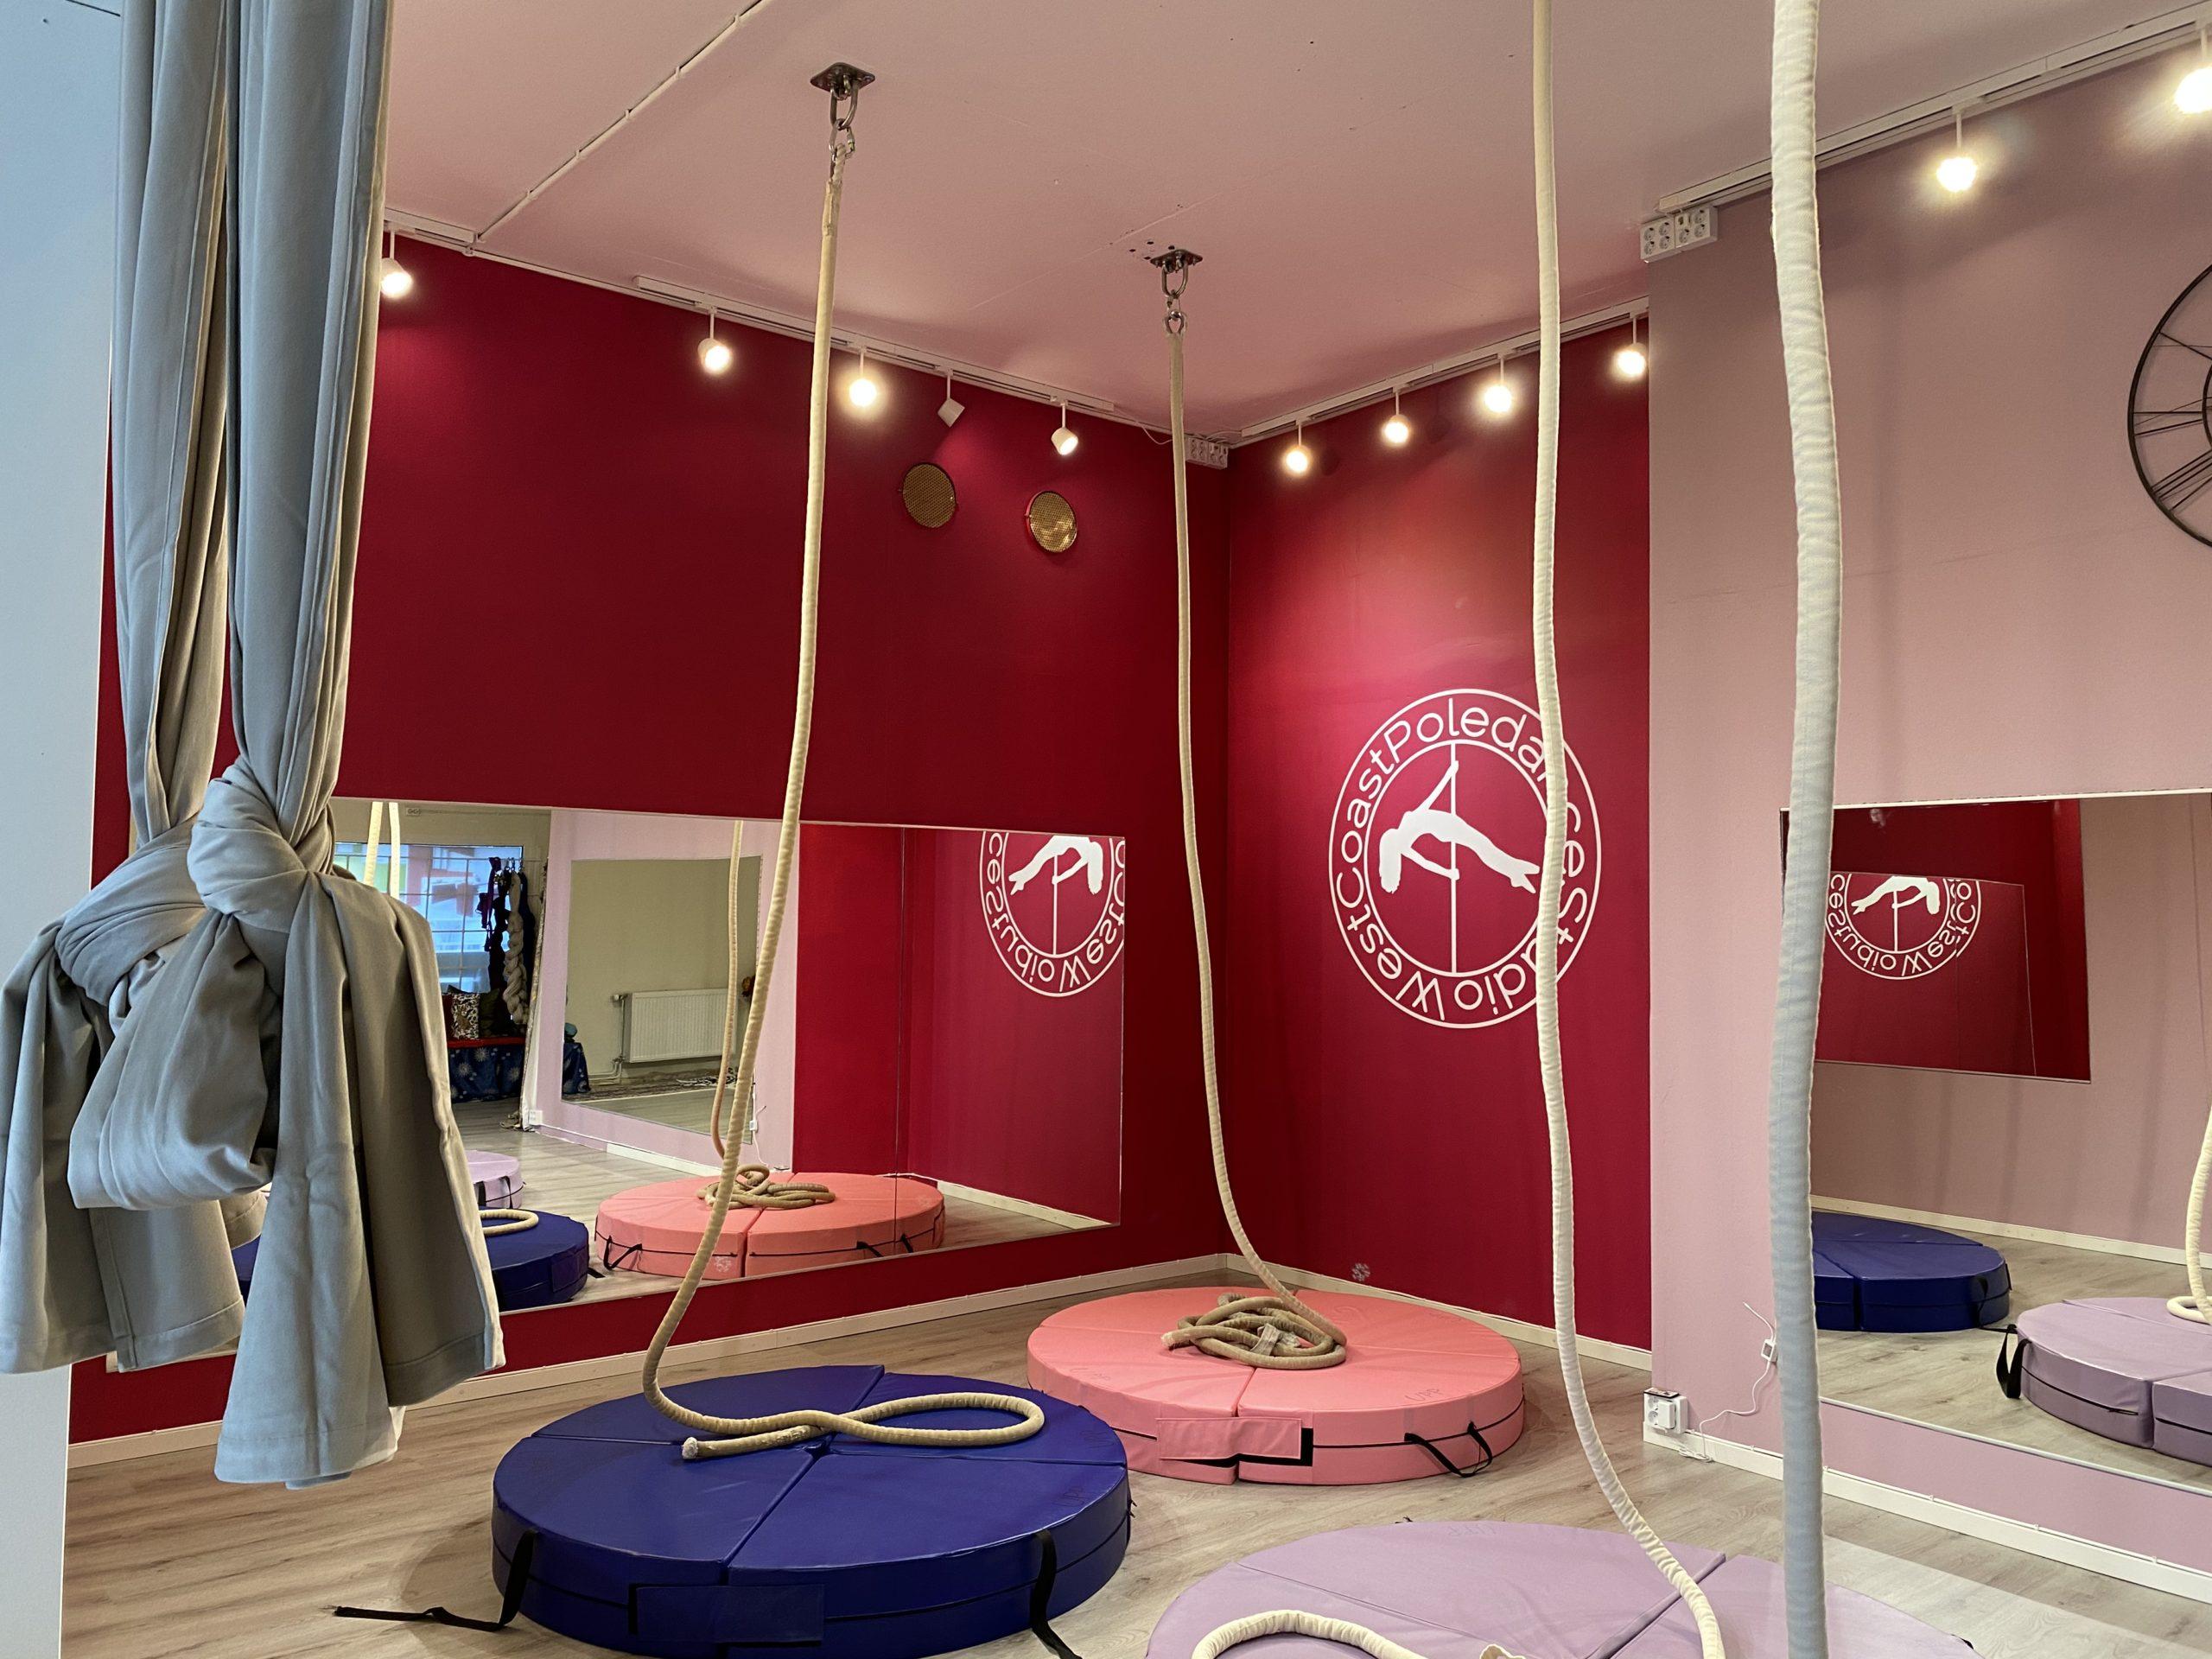 WCPS West Coast Poledance Studio westcoastpole Luftakrobatik Pole dance Dansskola Göteborg